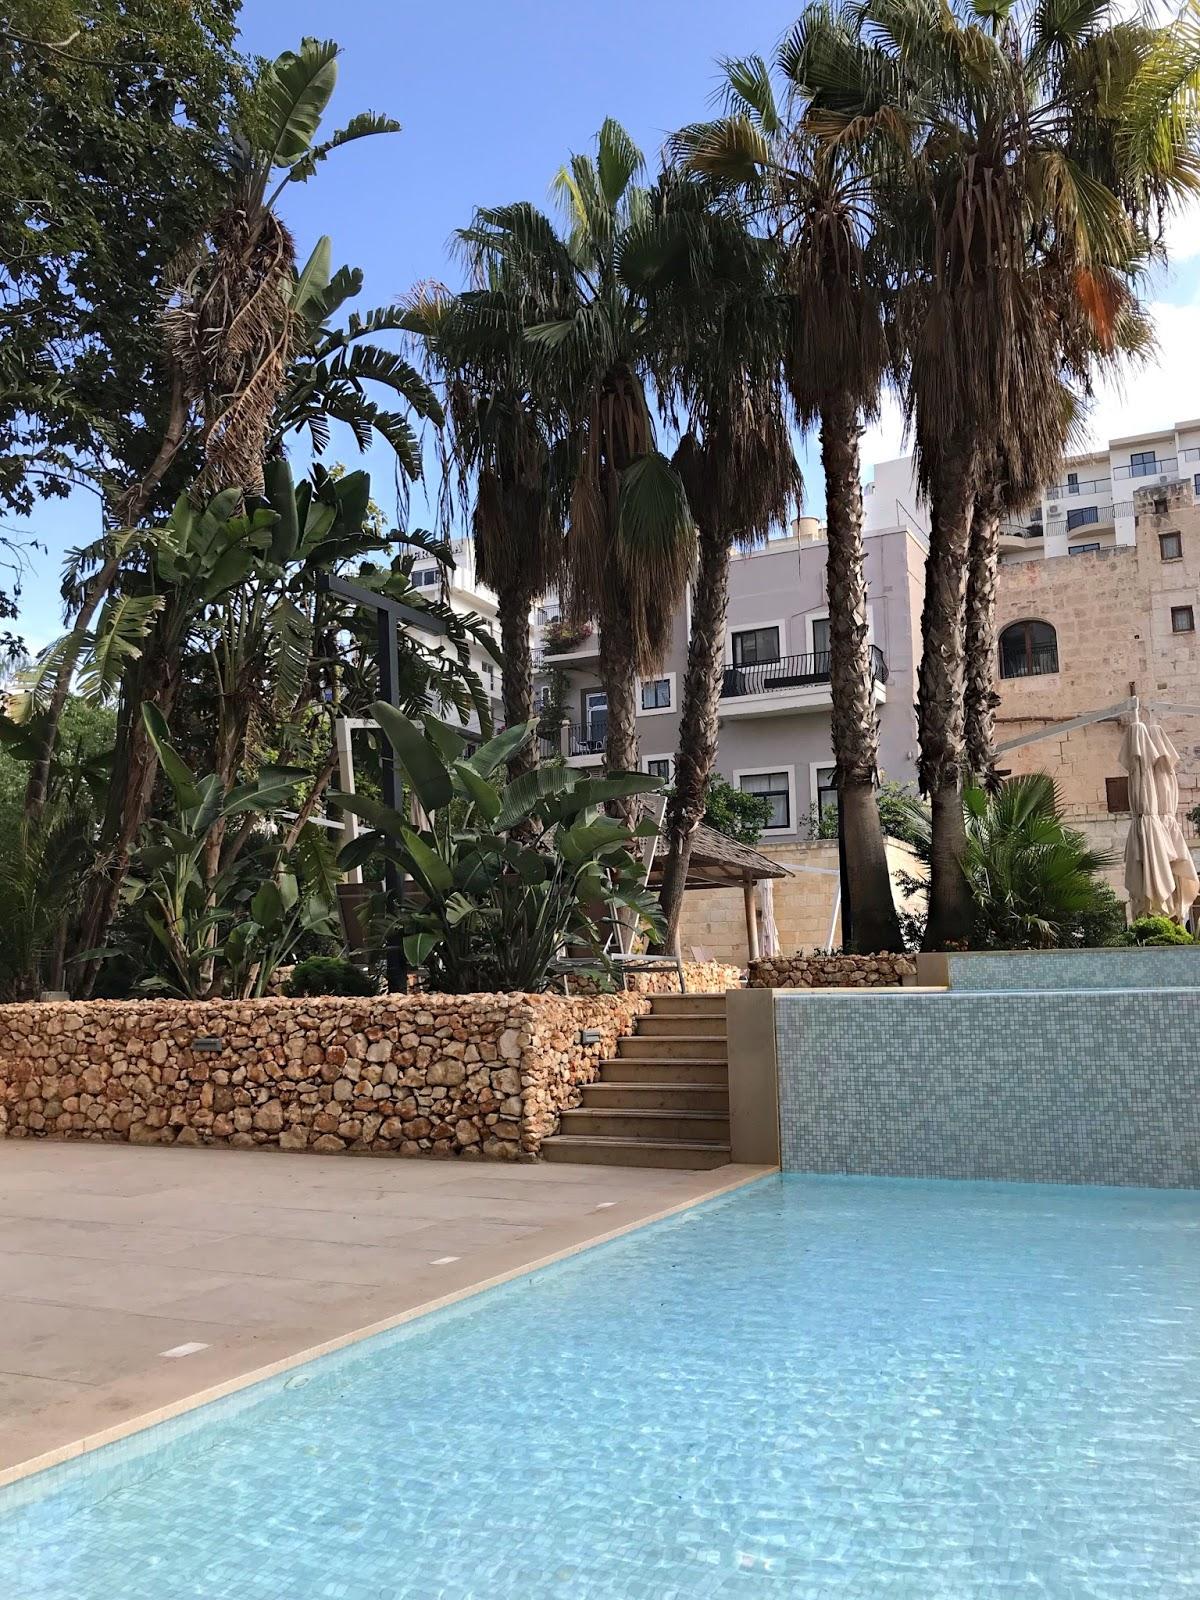 Hotel in Mellieha, Malta